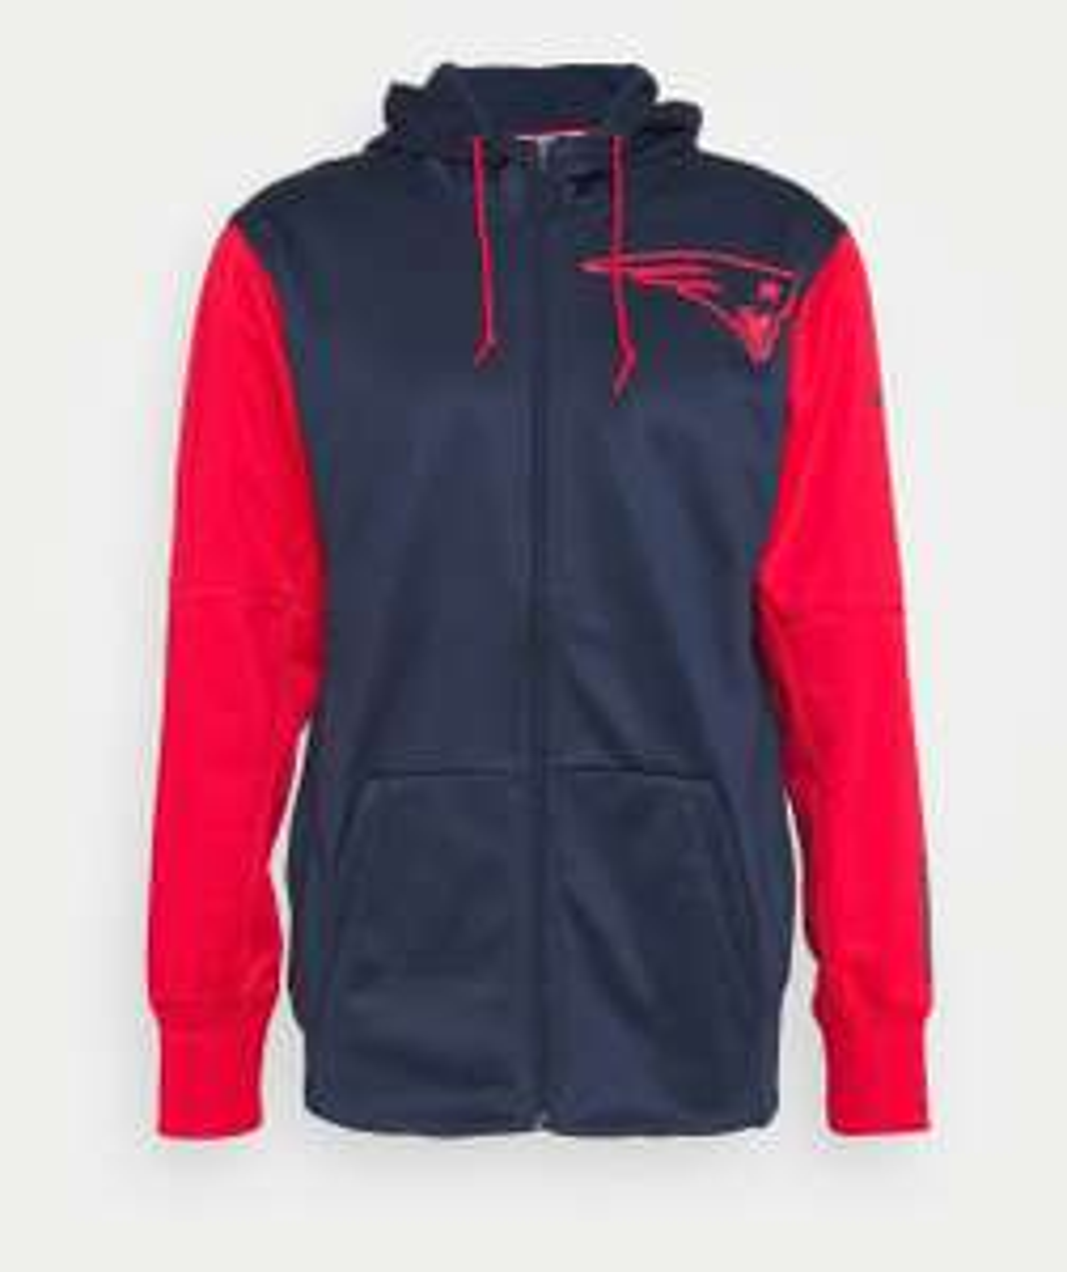 Nike NFL New England Patriots Jacket Now £26 Free delivery @ Zalando